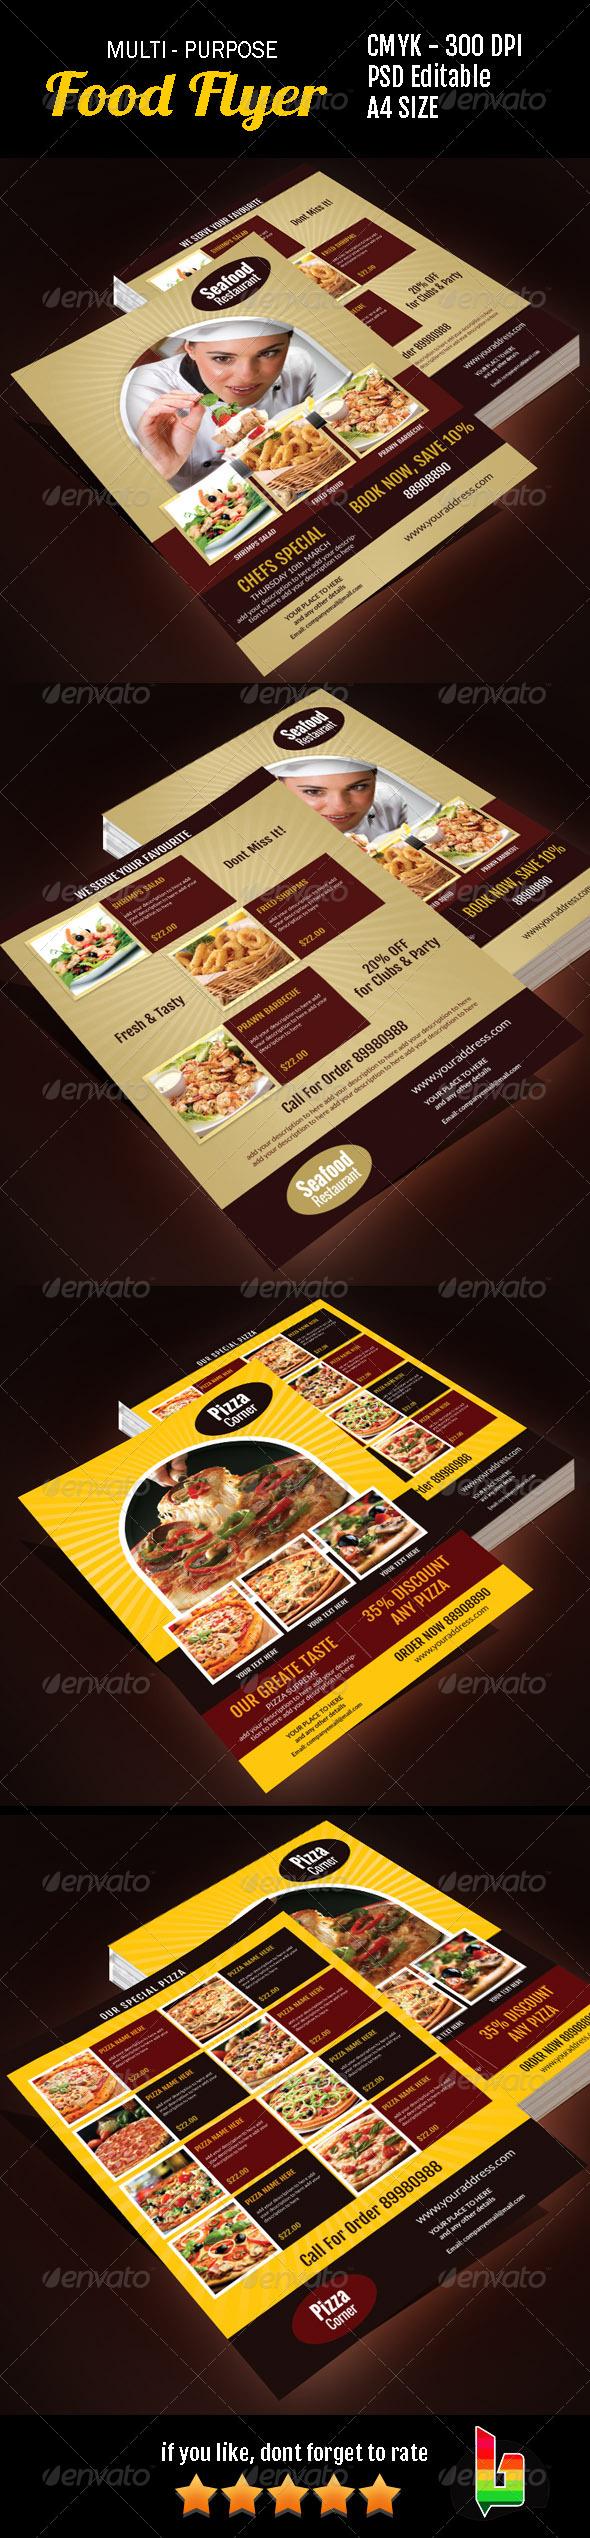 Multi Purpose Food Flyer - Restaurant Flyers